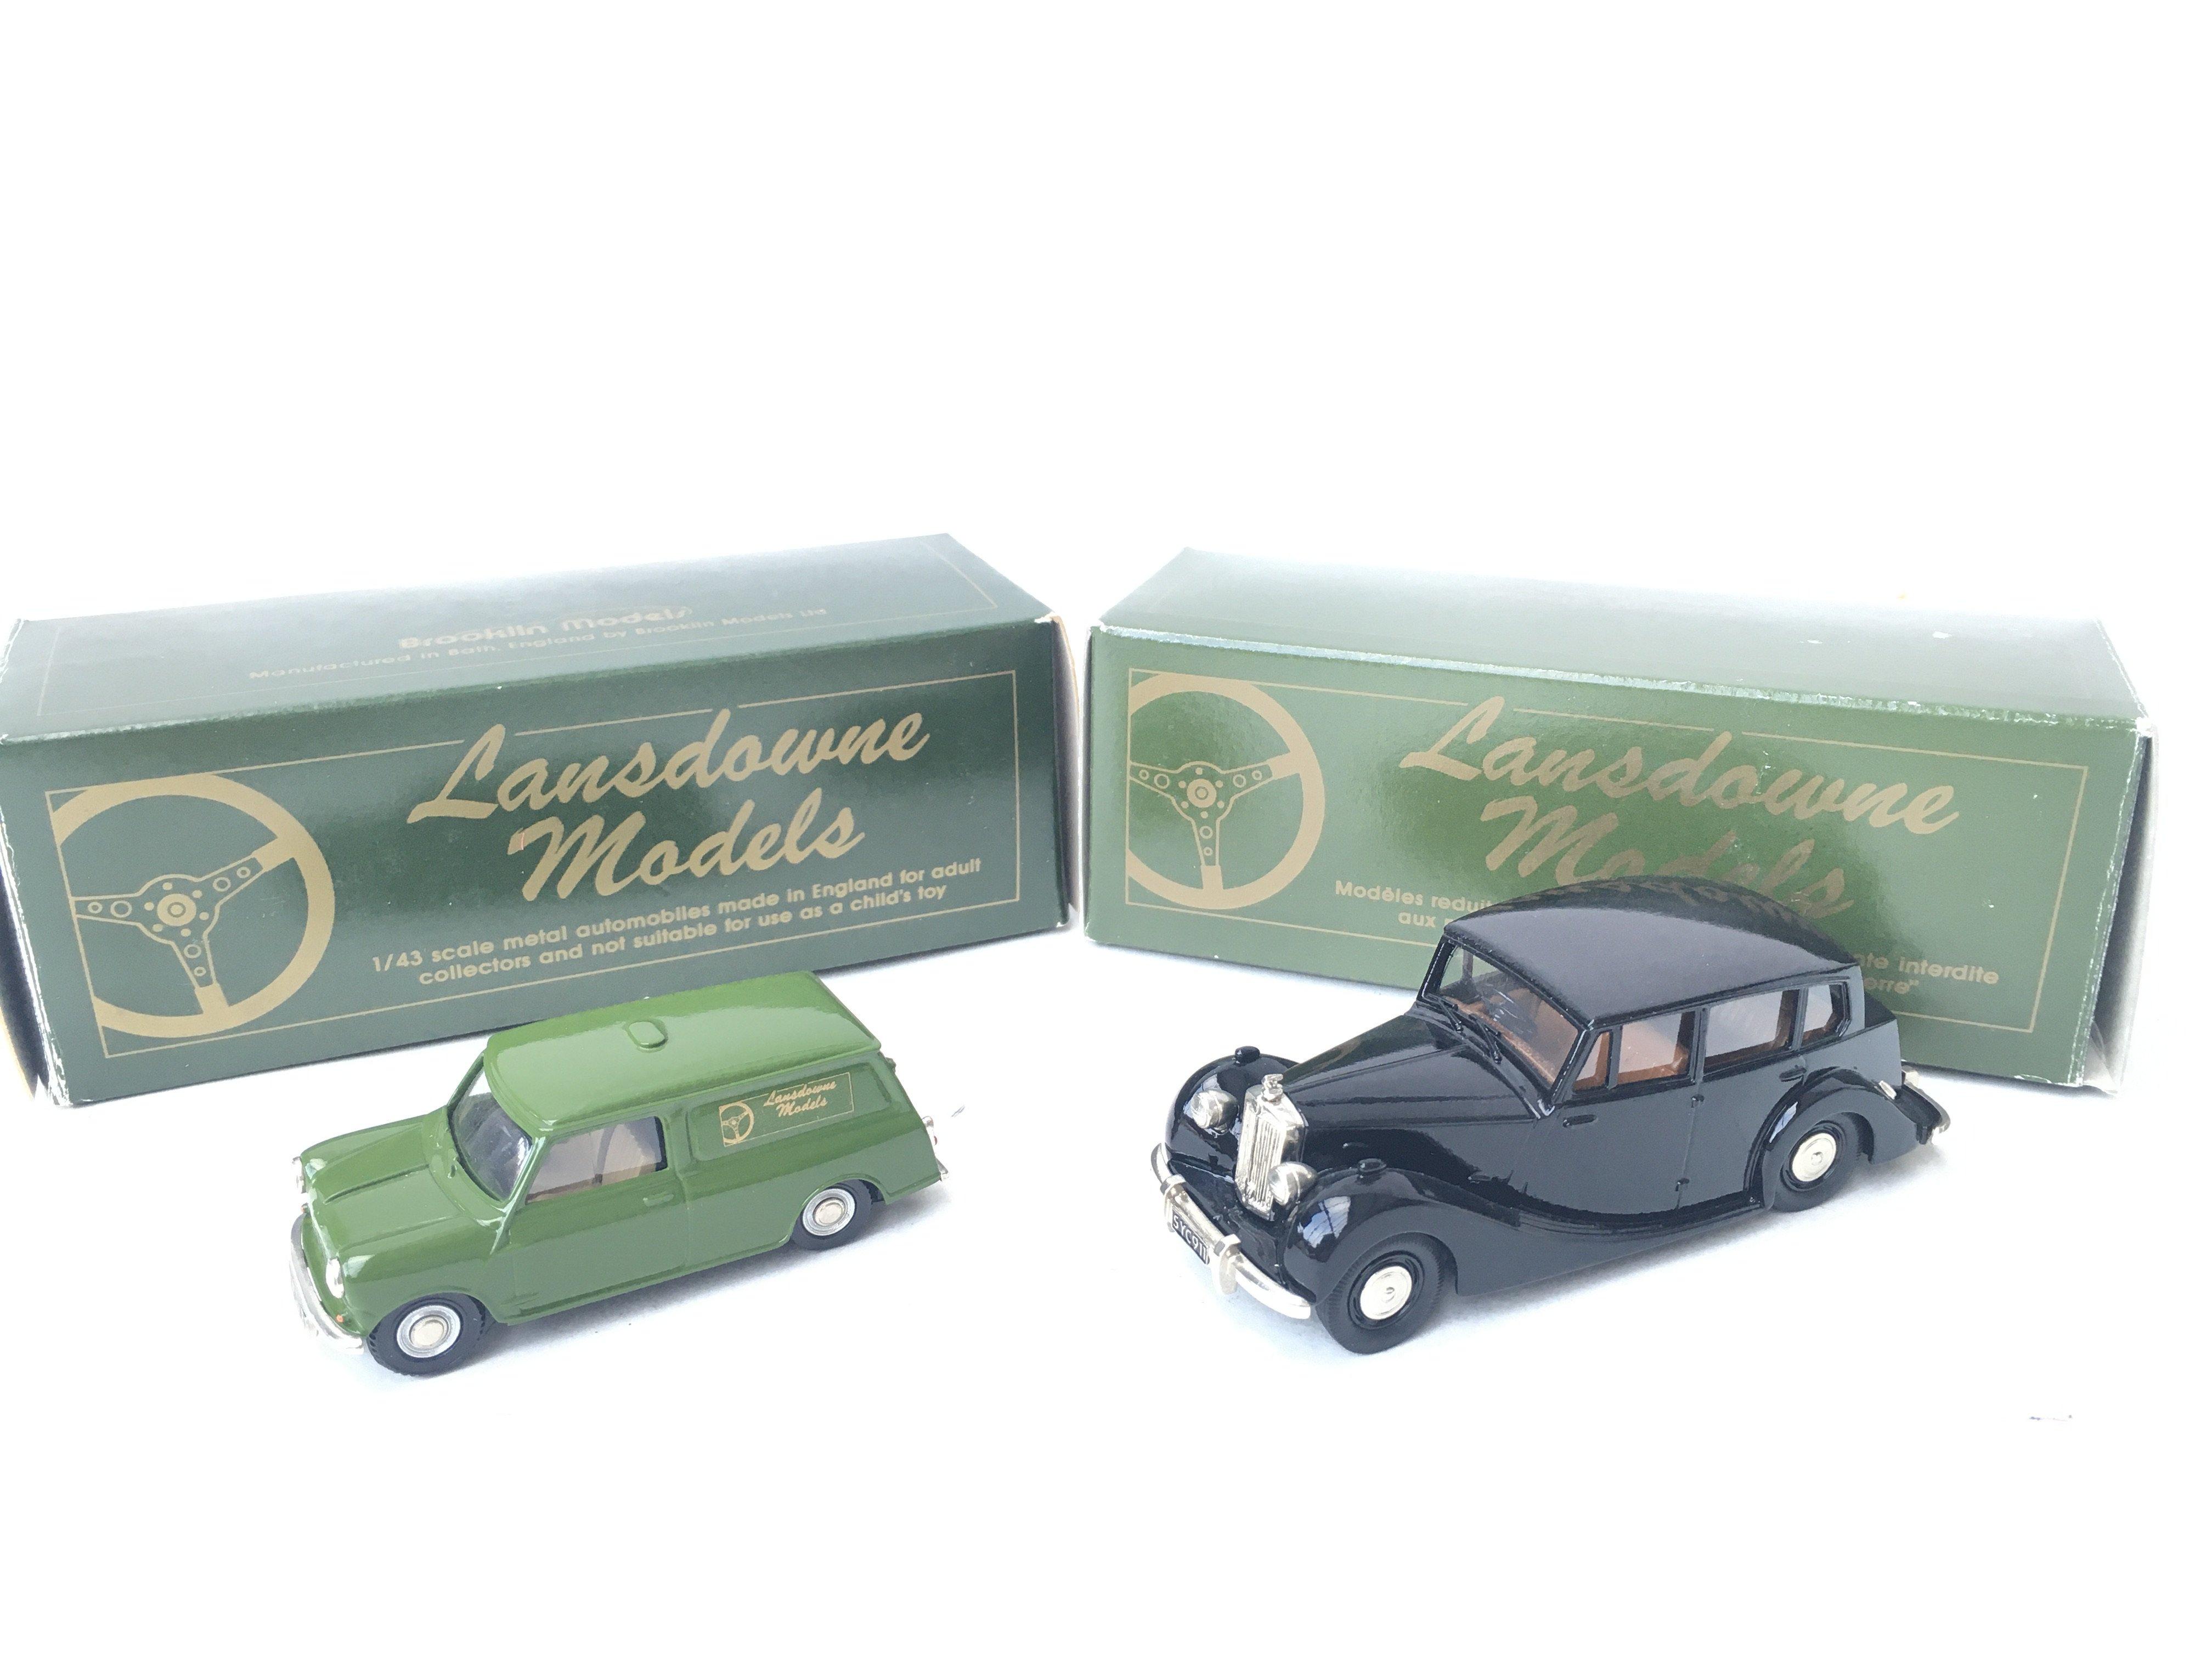 2 X Lansdowne Models including LD4 1962 Morris Min